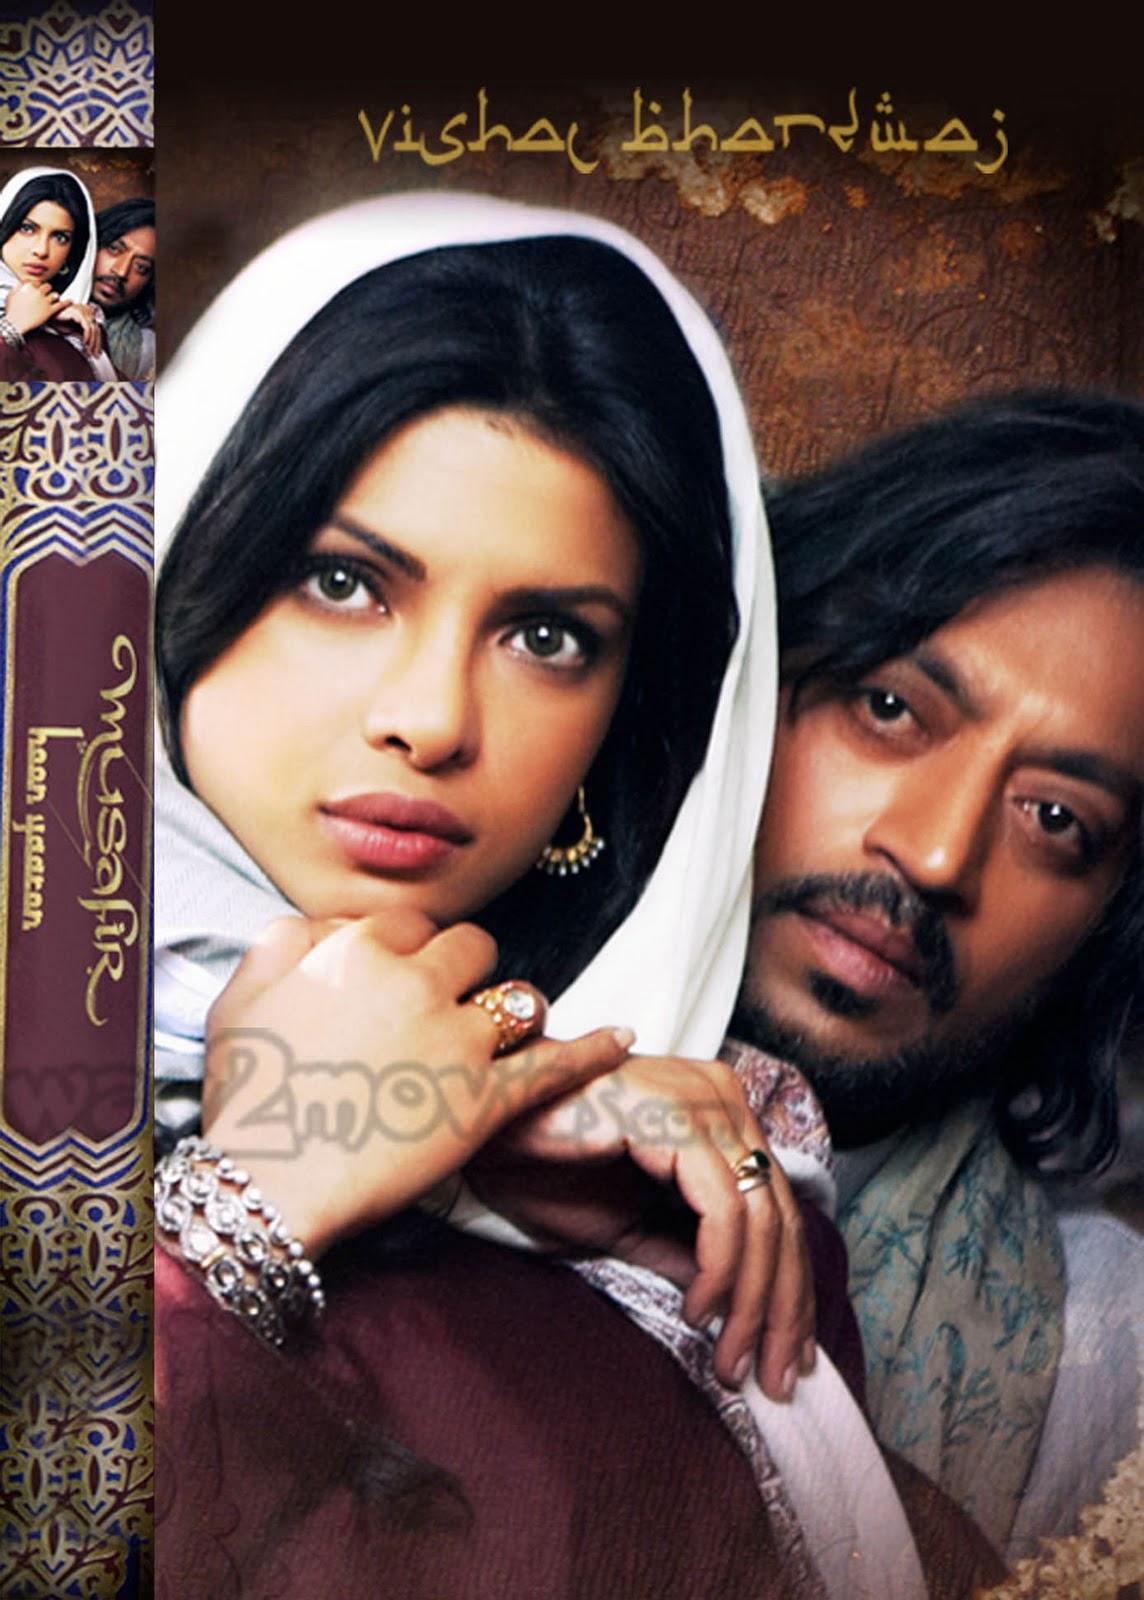 http://3.bp.blogspot.com/_Eu93LBqu4i8/TVJgKjd-zfI/AAAAAAAABvc/hjpuYHmFAxc/s1600/7-Khoon-Maaf-Movie-Posters-5.jpg